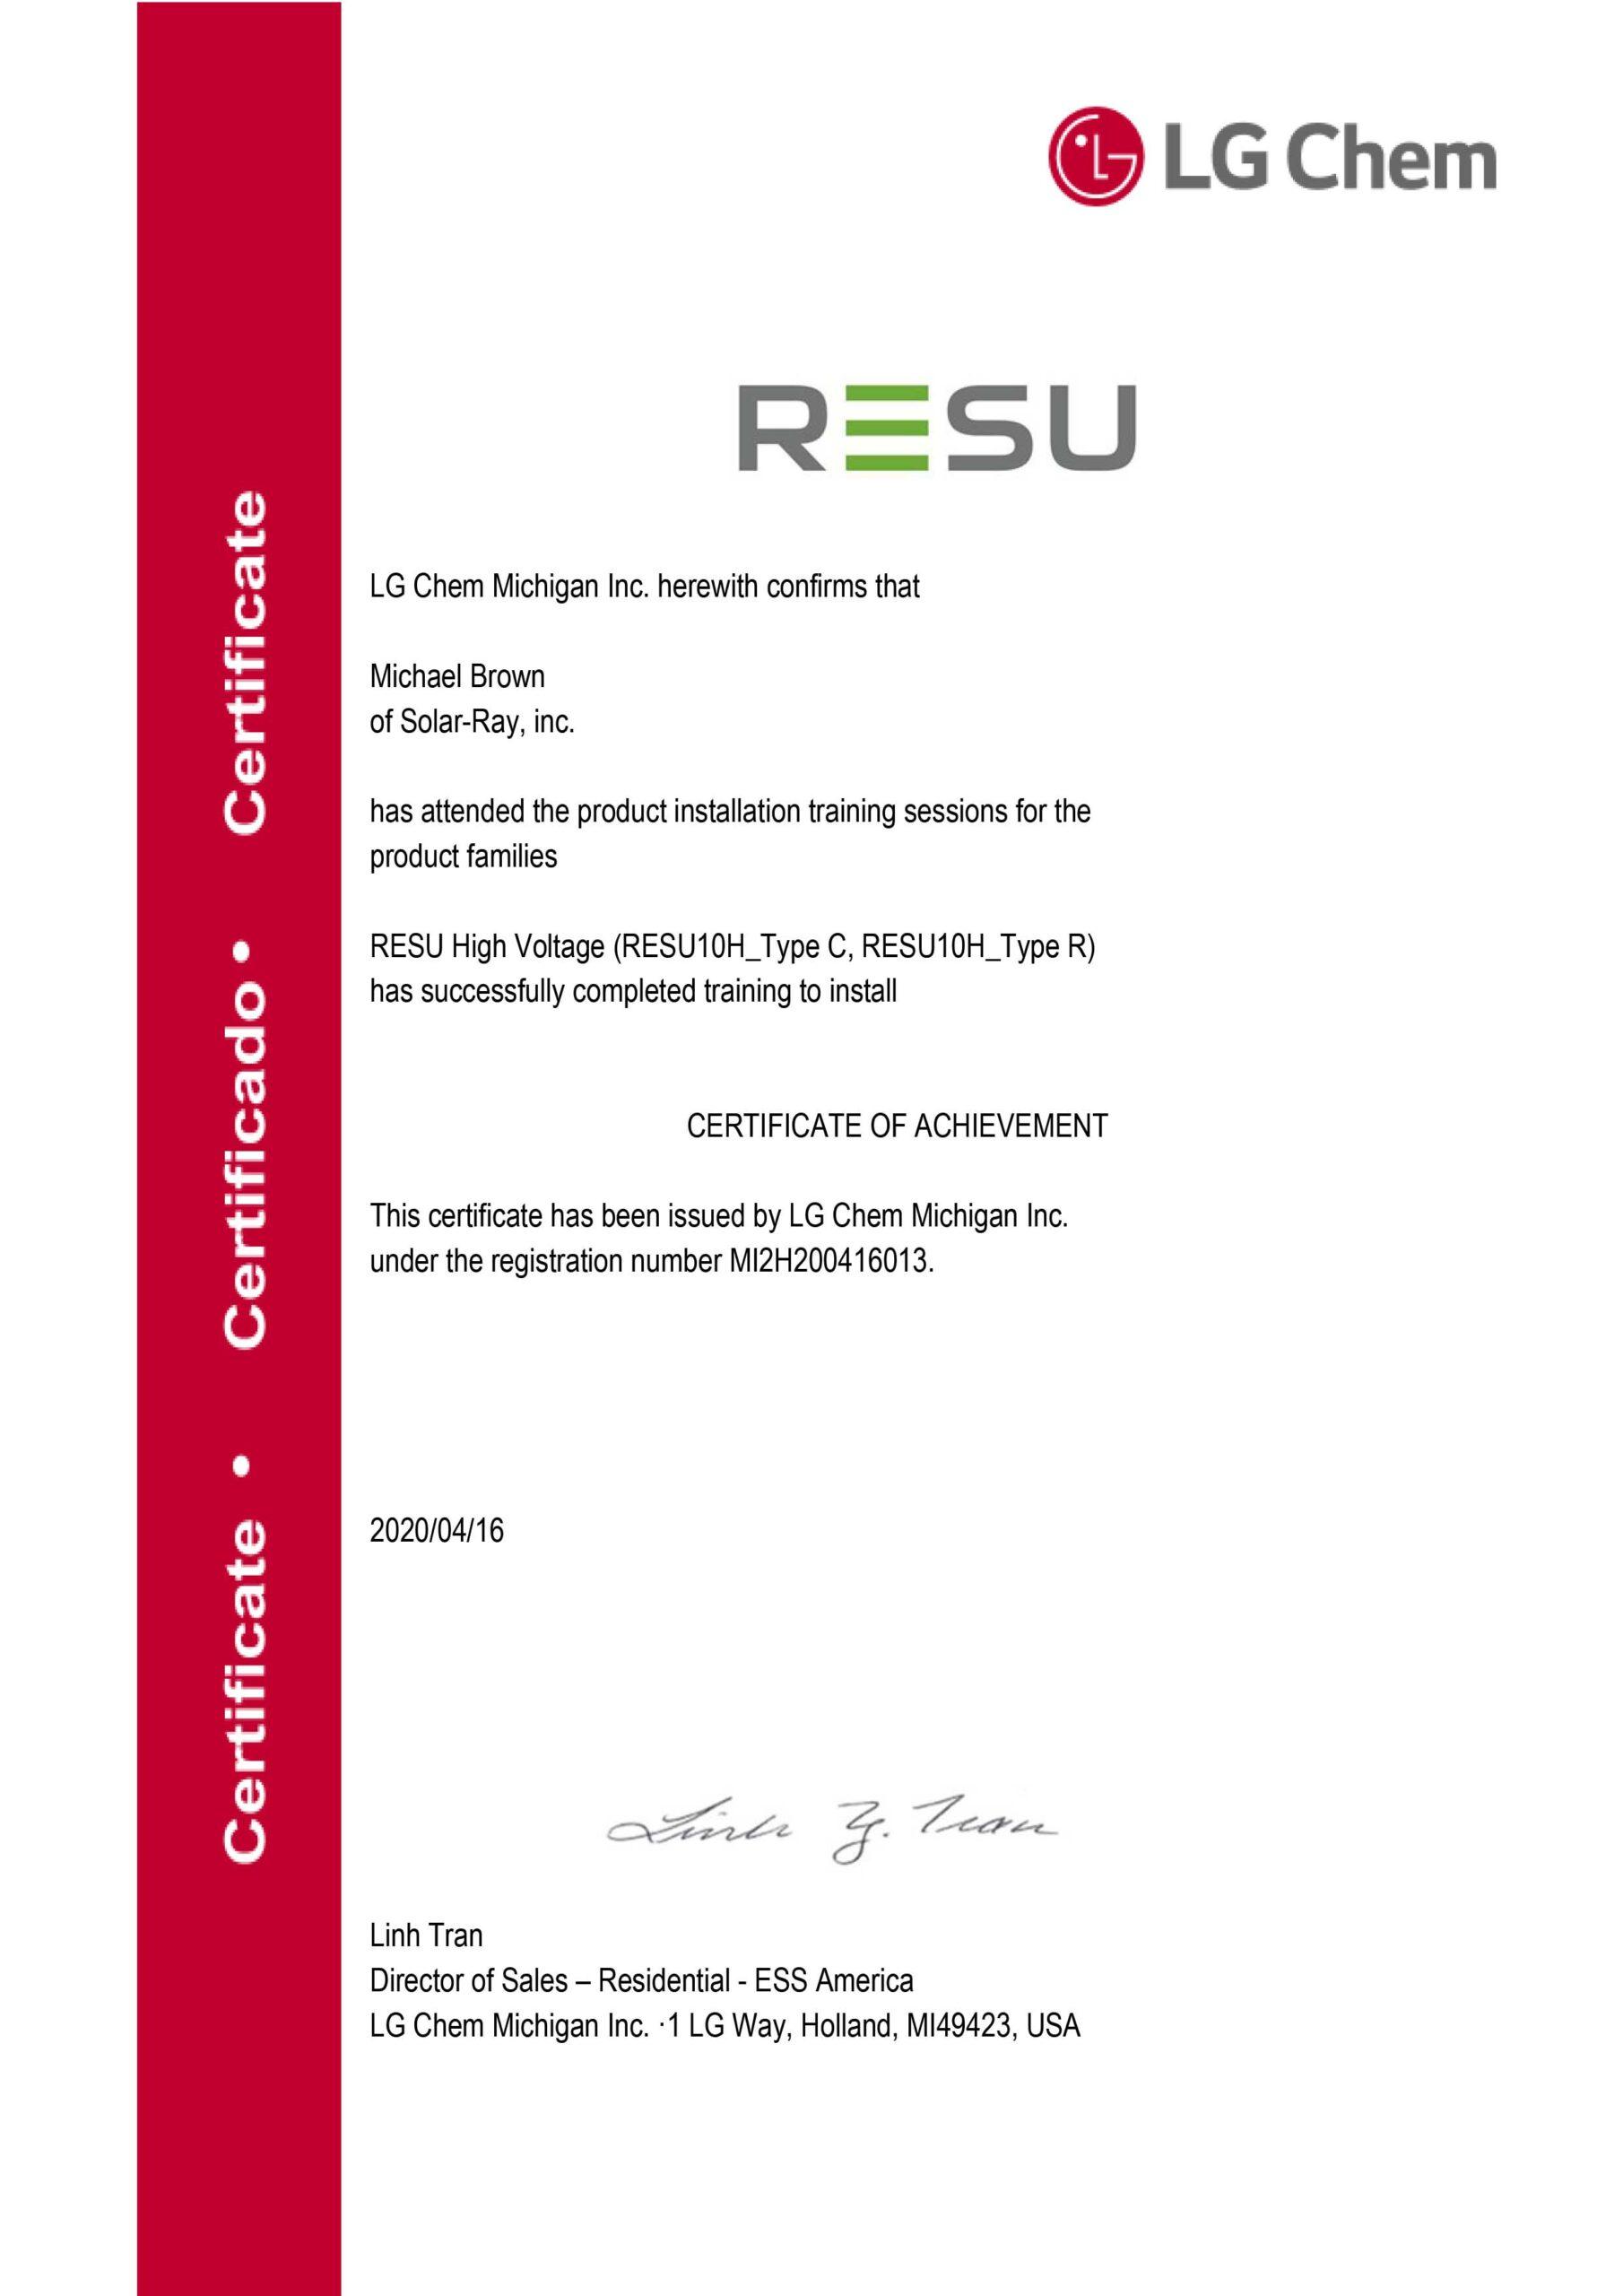 [LG Chem] Certified Installer for RESU10H_Solar-Ray, inc.